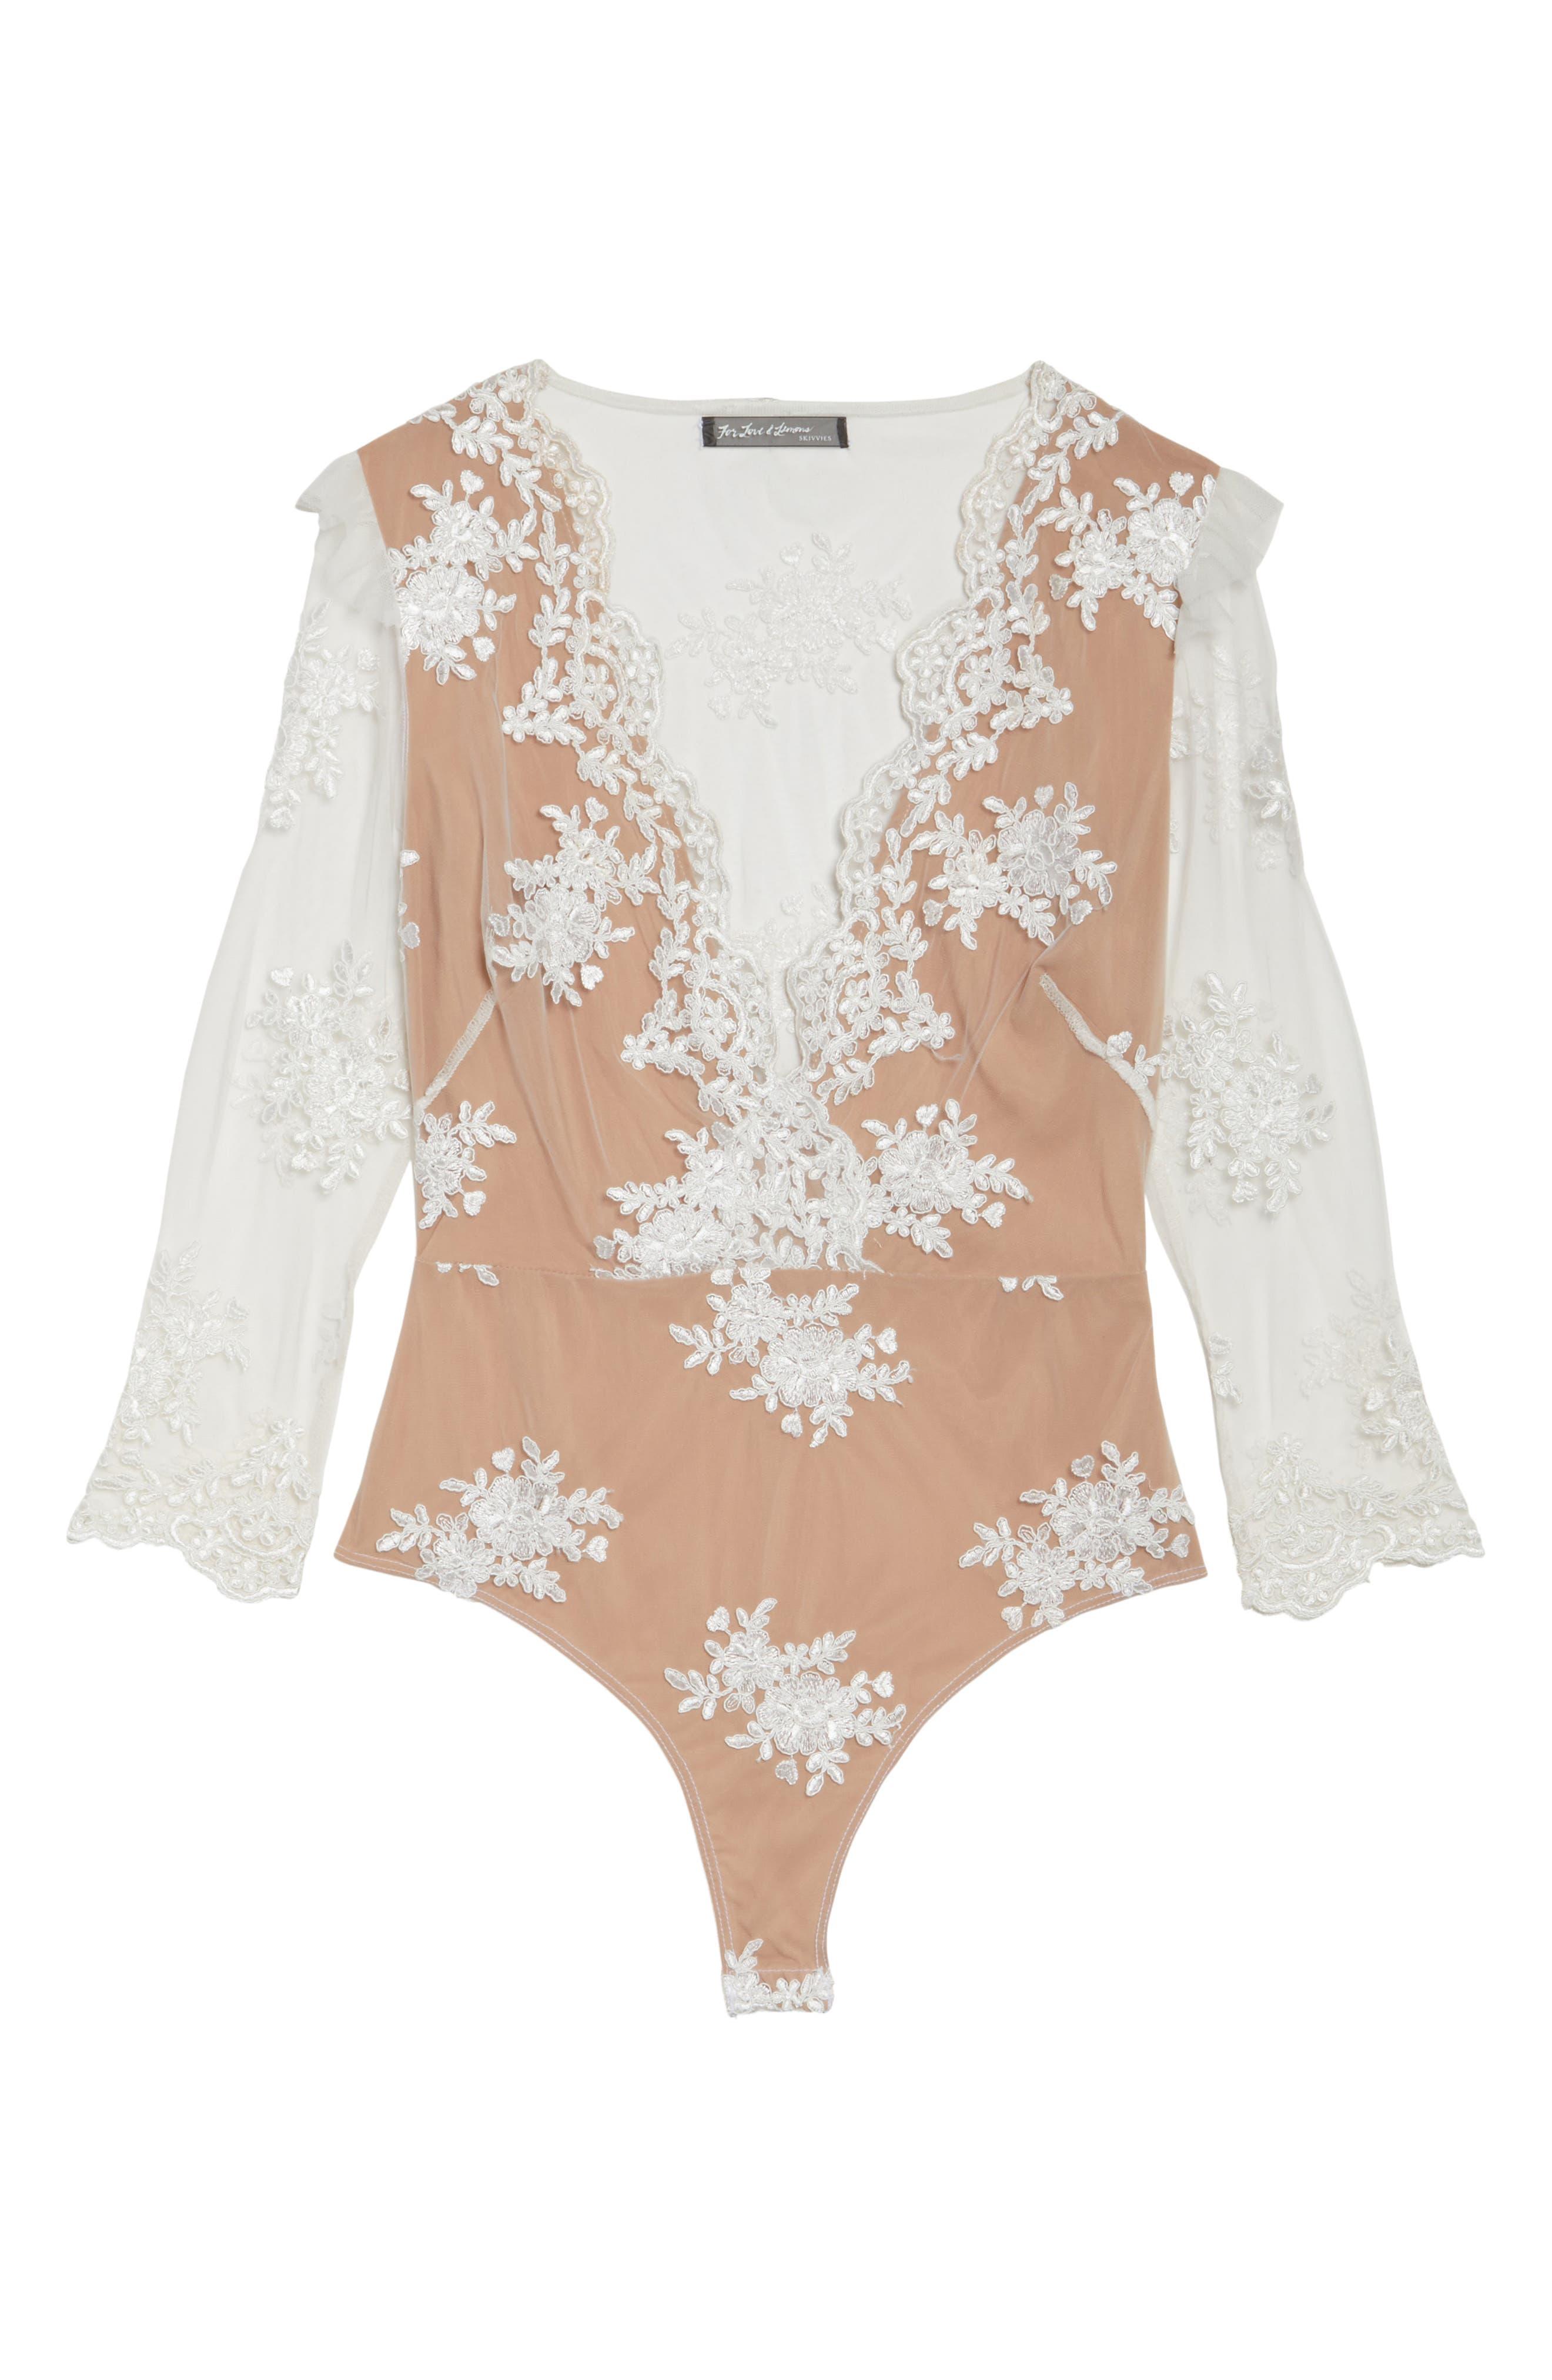 Amber Thong Bodysuit,                             Alternate thumbnail 6, color,                             Blanc